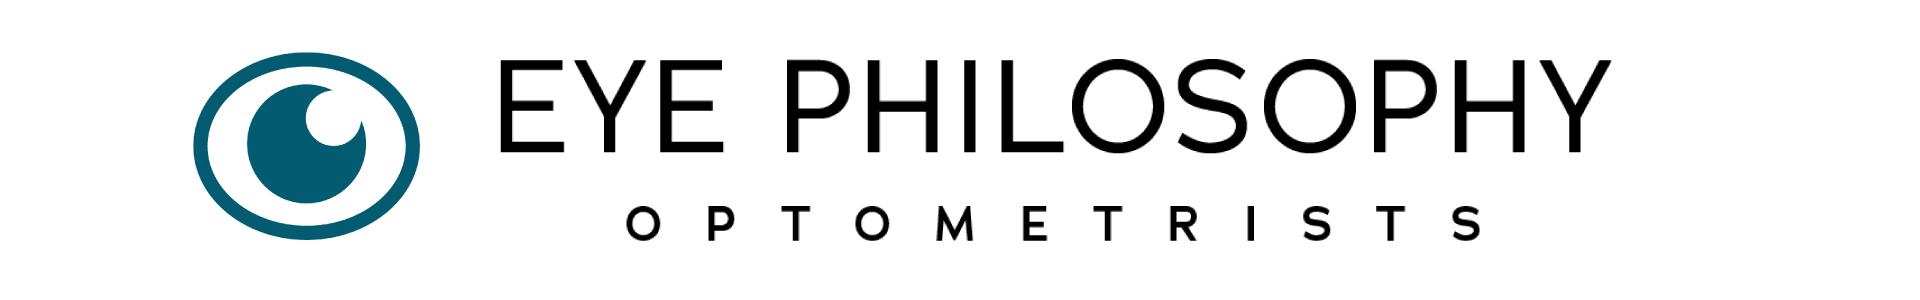 Eye Philosophy (by Brazionis Eyecare)